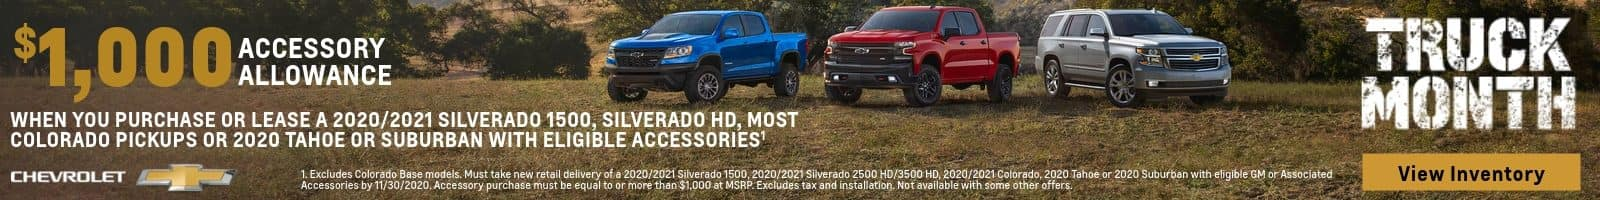 truck month vrp desktop